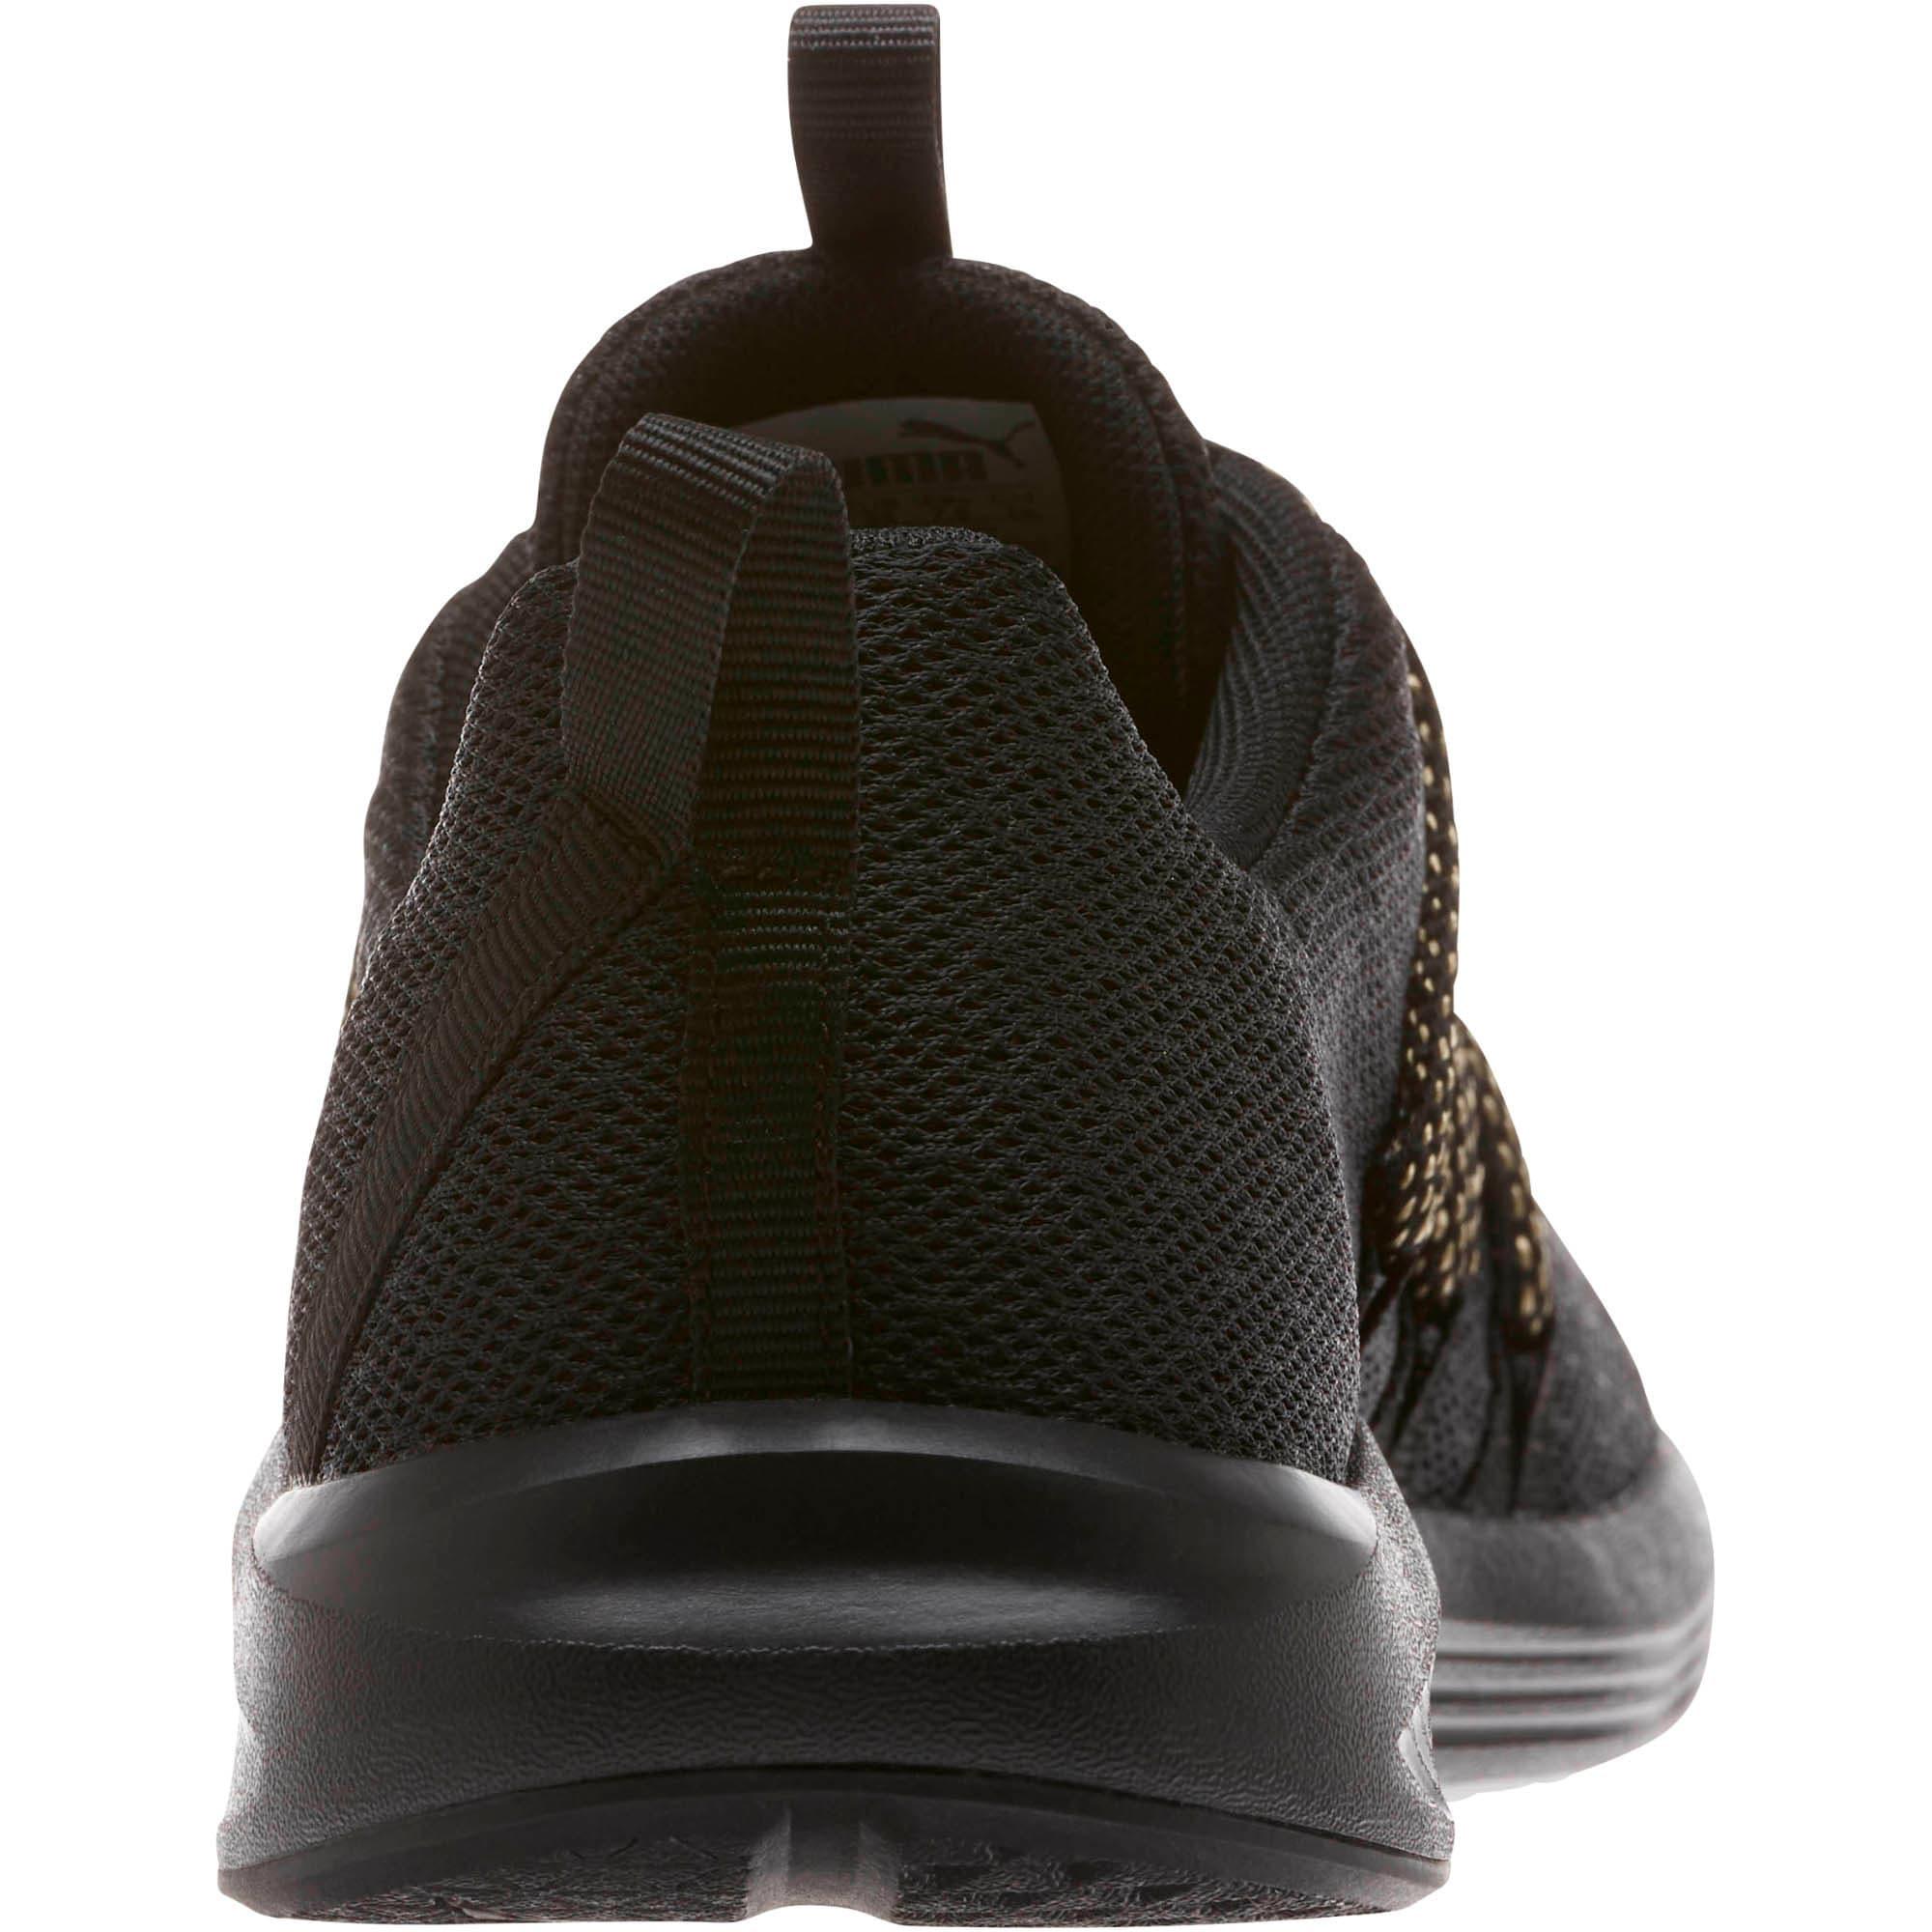 Thumbnail 4 of Prowl Alt Knit Mesh Women's Running Shoes, Puma Black-Metallic Gold, medium